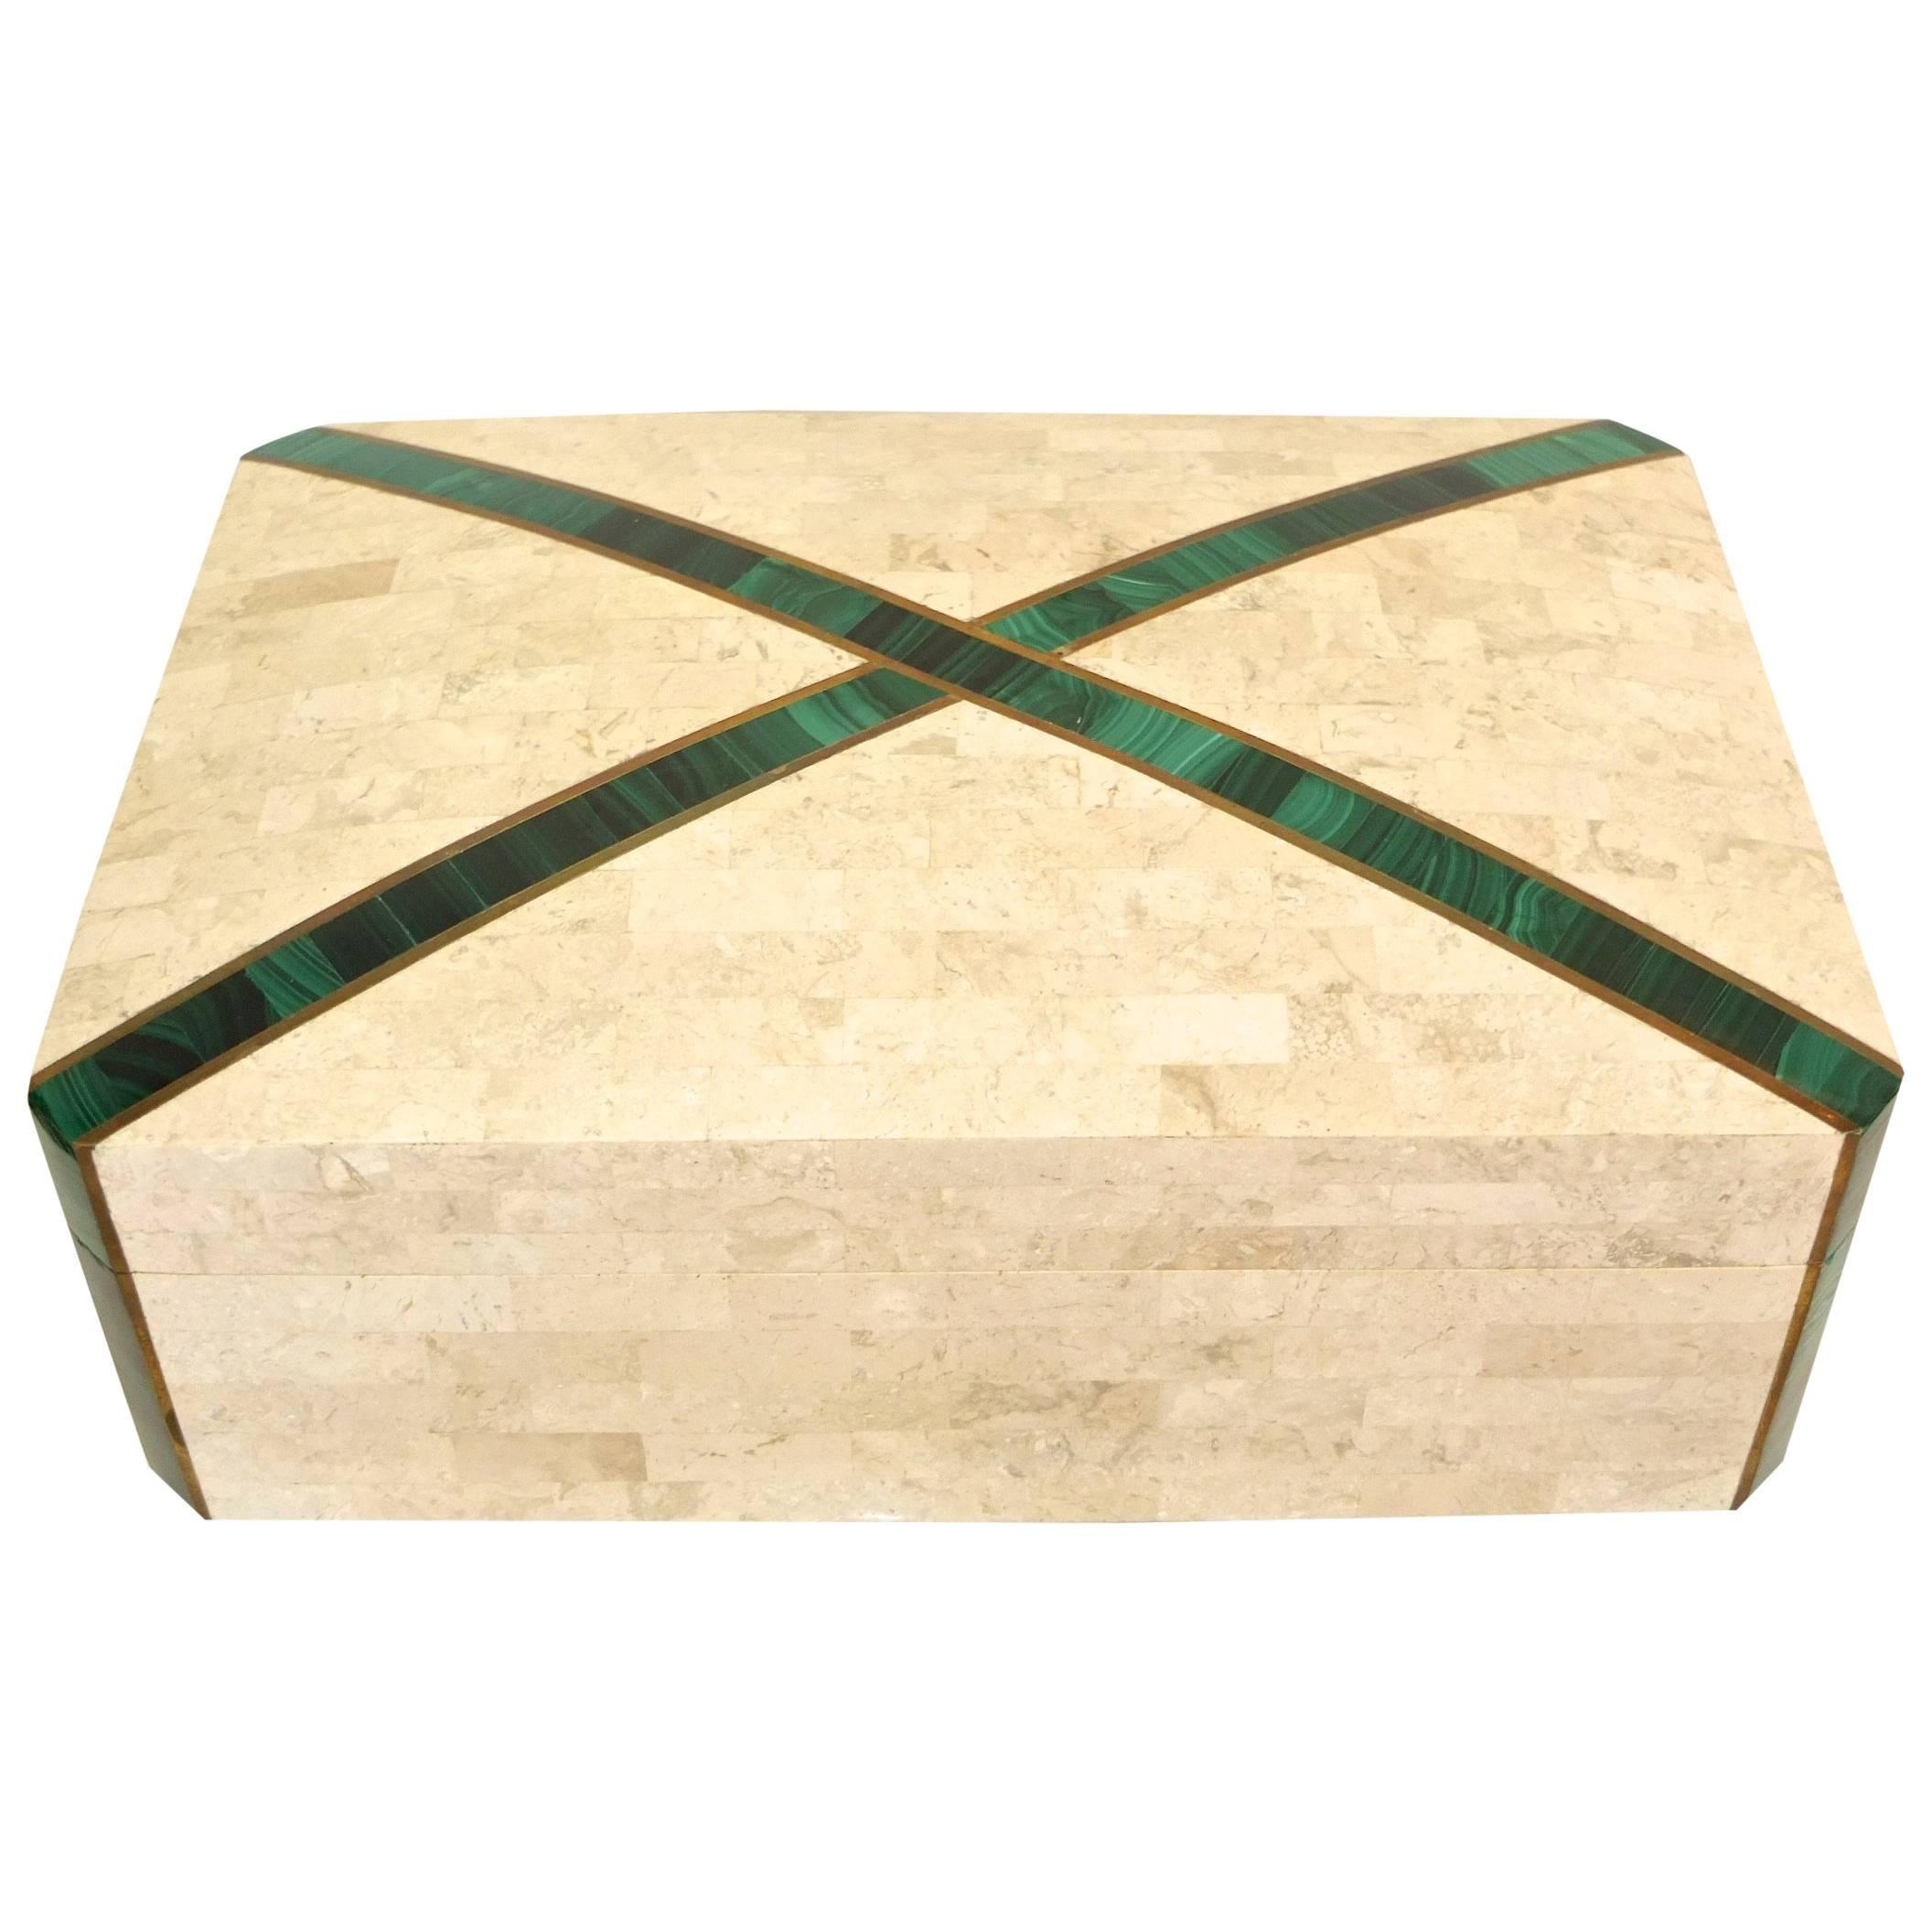 Large Tessellated Stone Box with Brass and Malachite